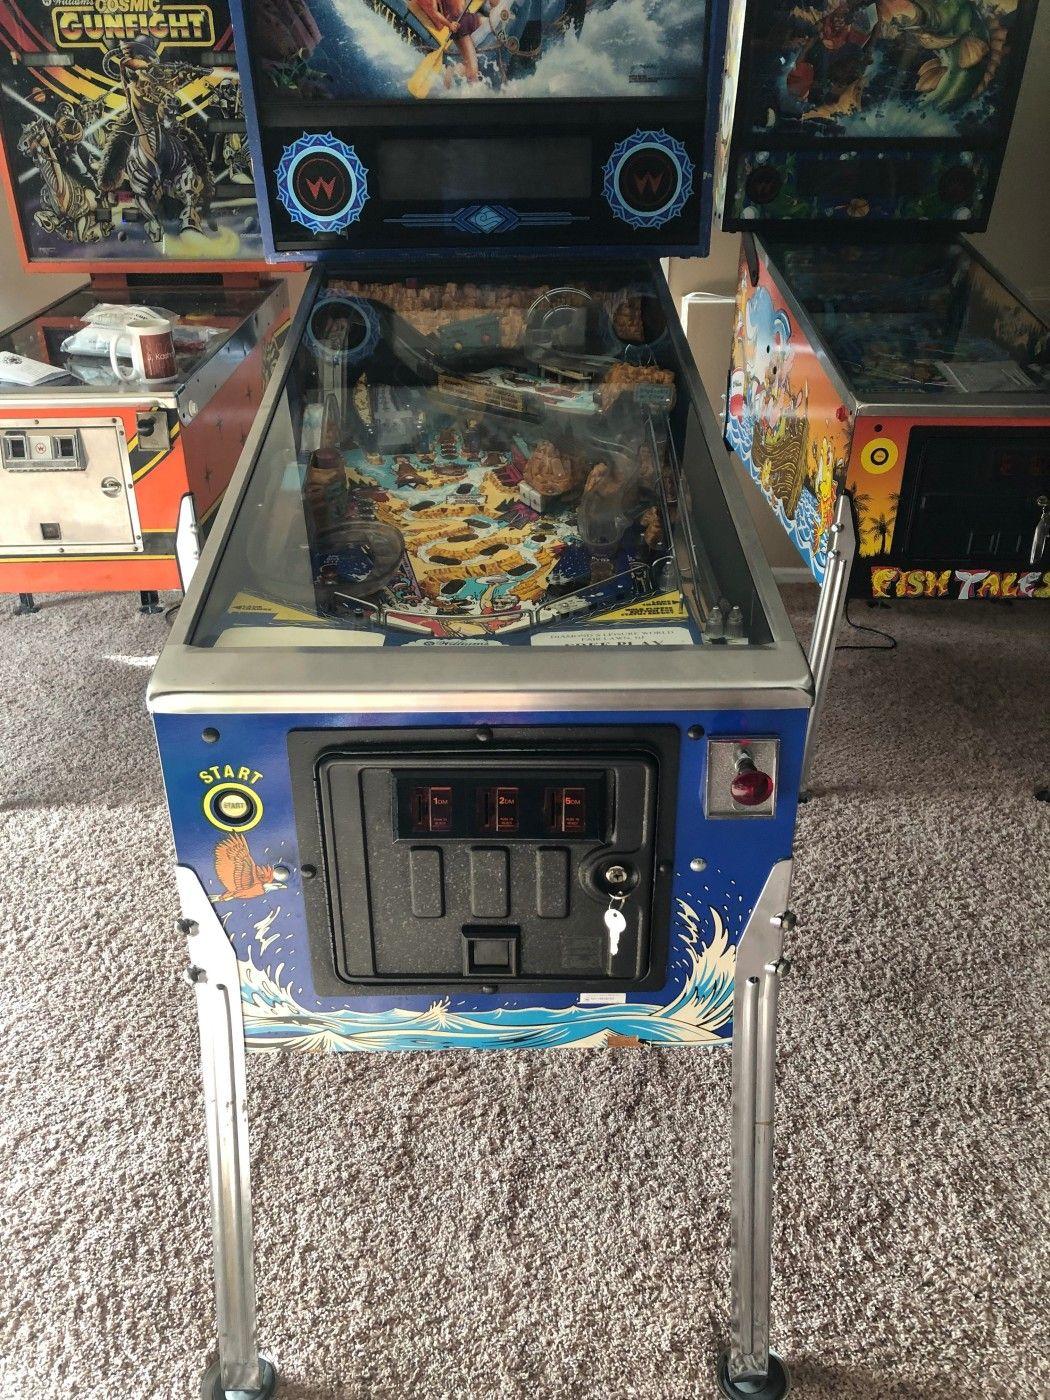 902 Games Virtual Flipper Pinball Arcade Game Machine for Amusement